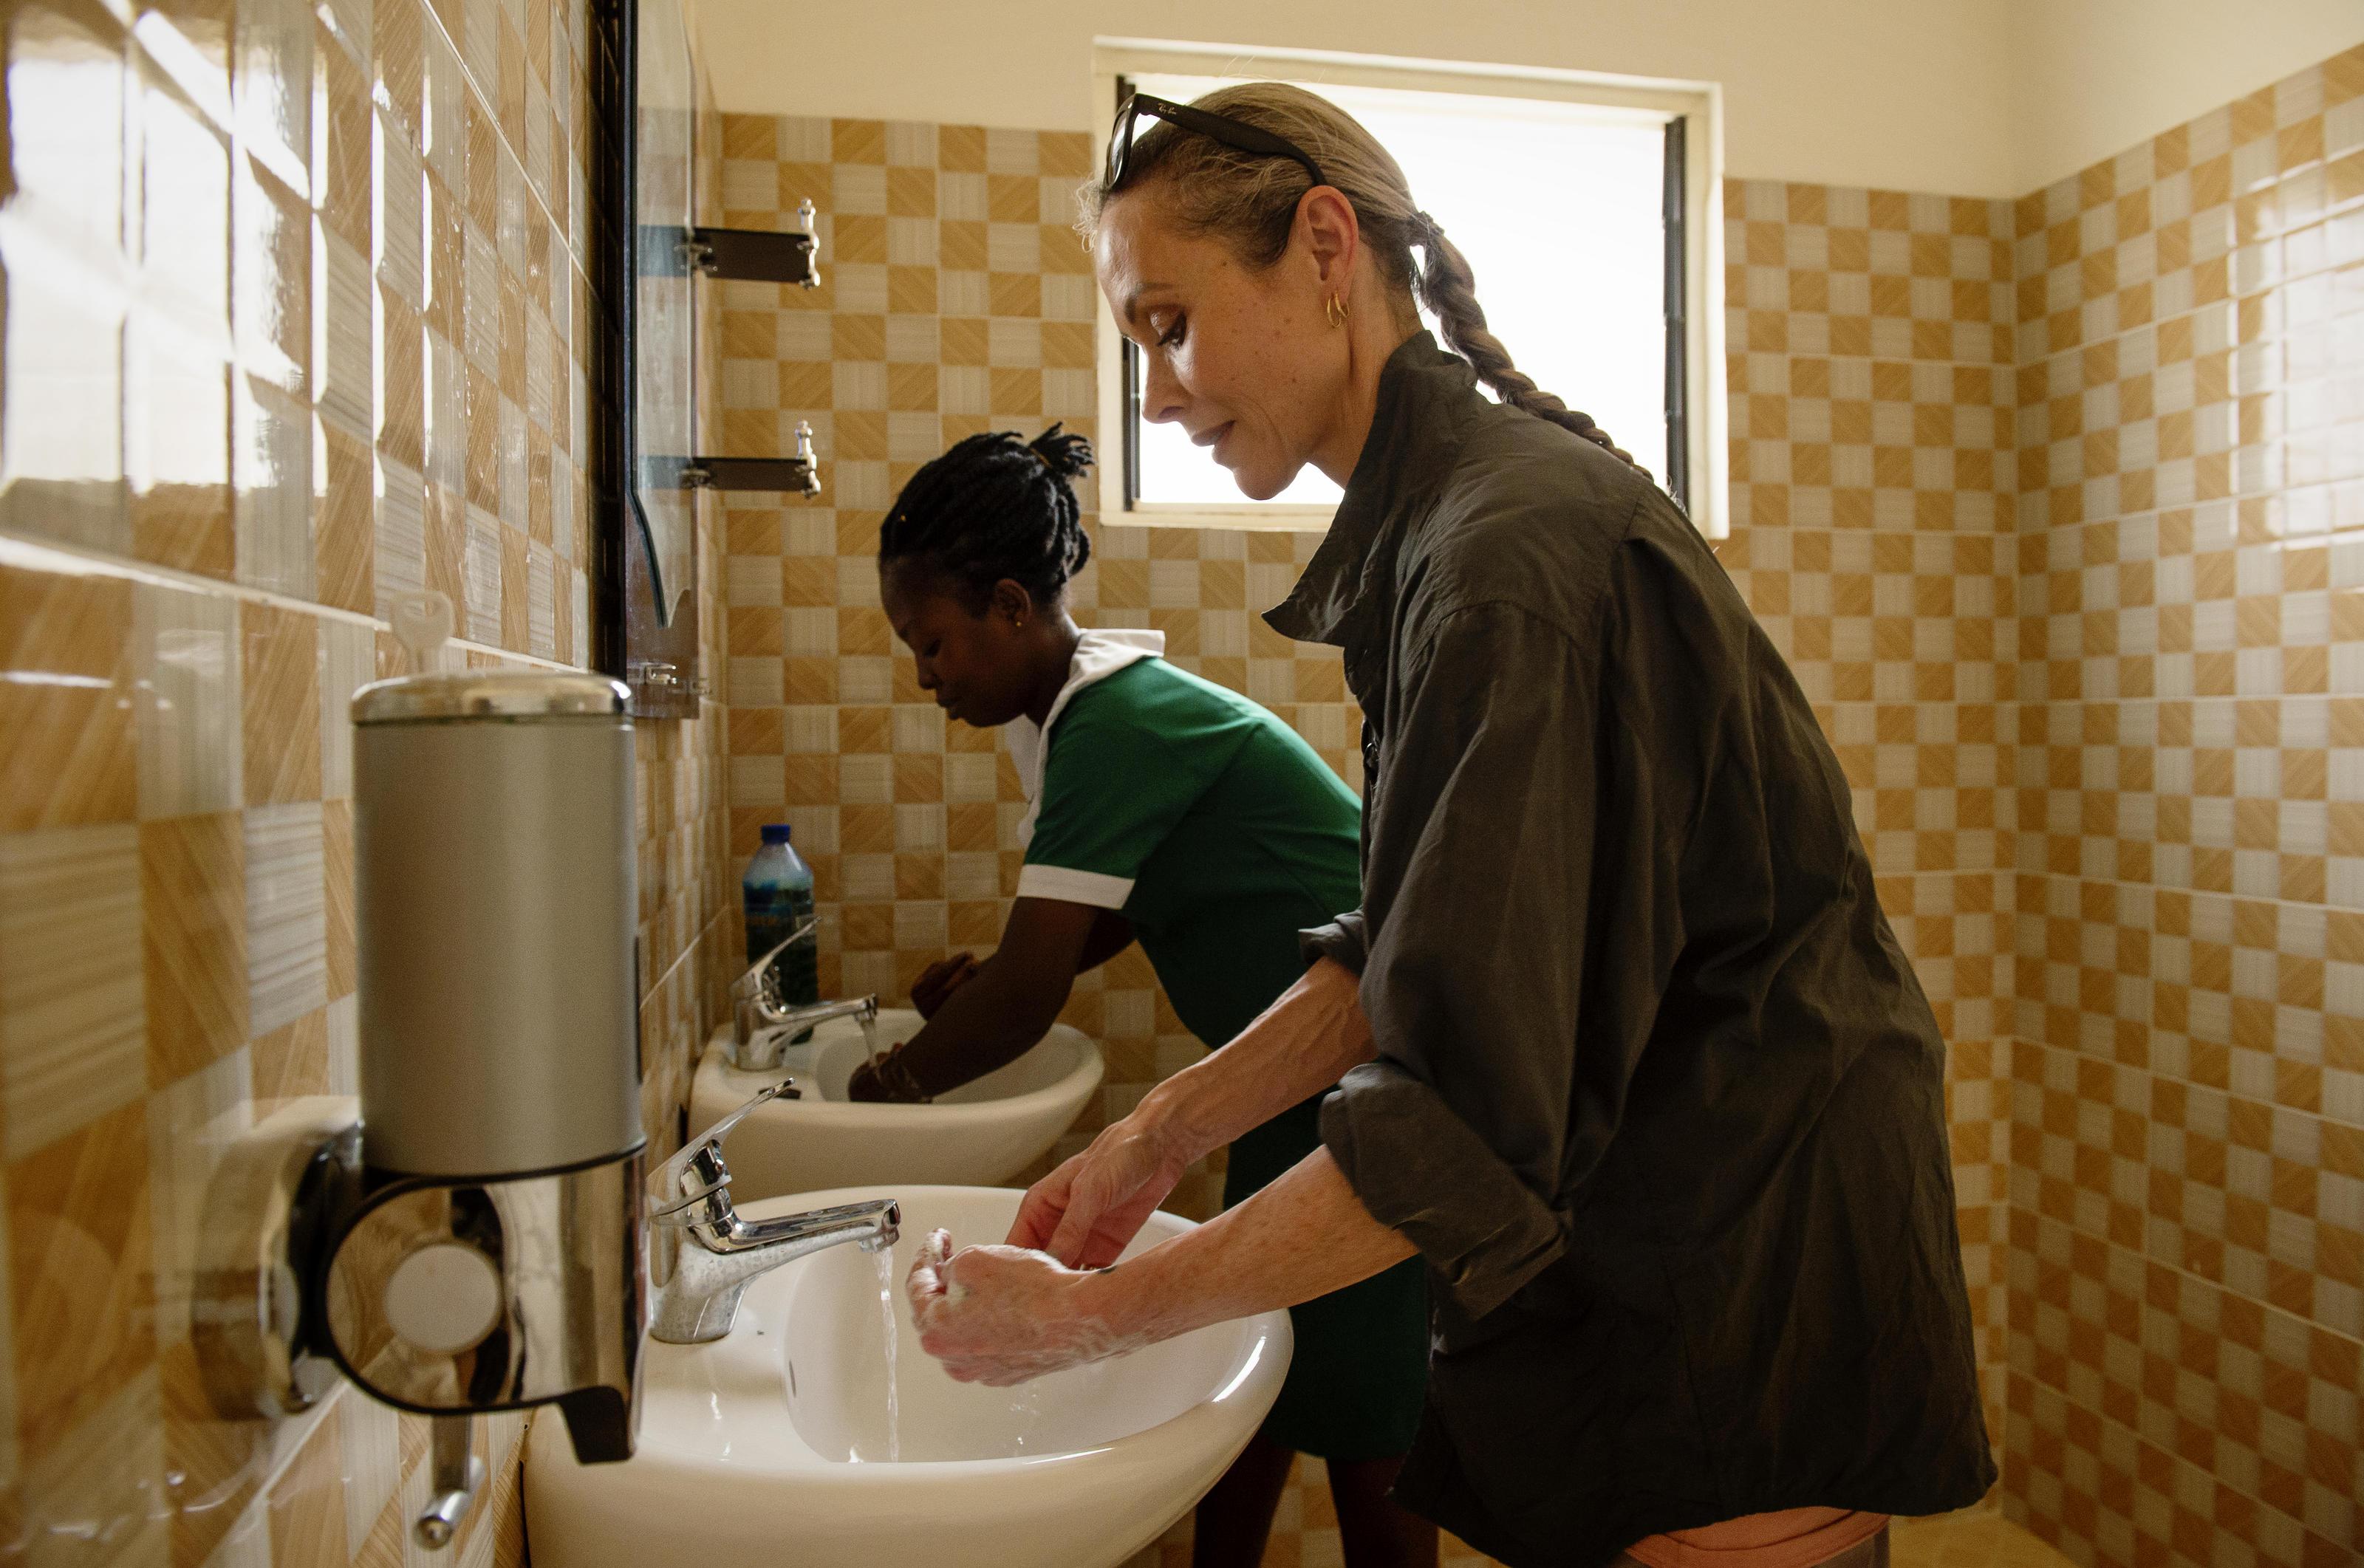 Amanda Mealing Actress amanda mealing: healthcare from holby to ghana   wateraid uk